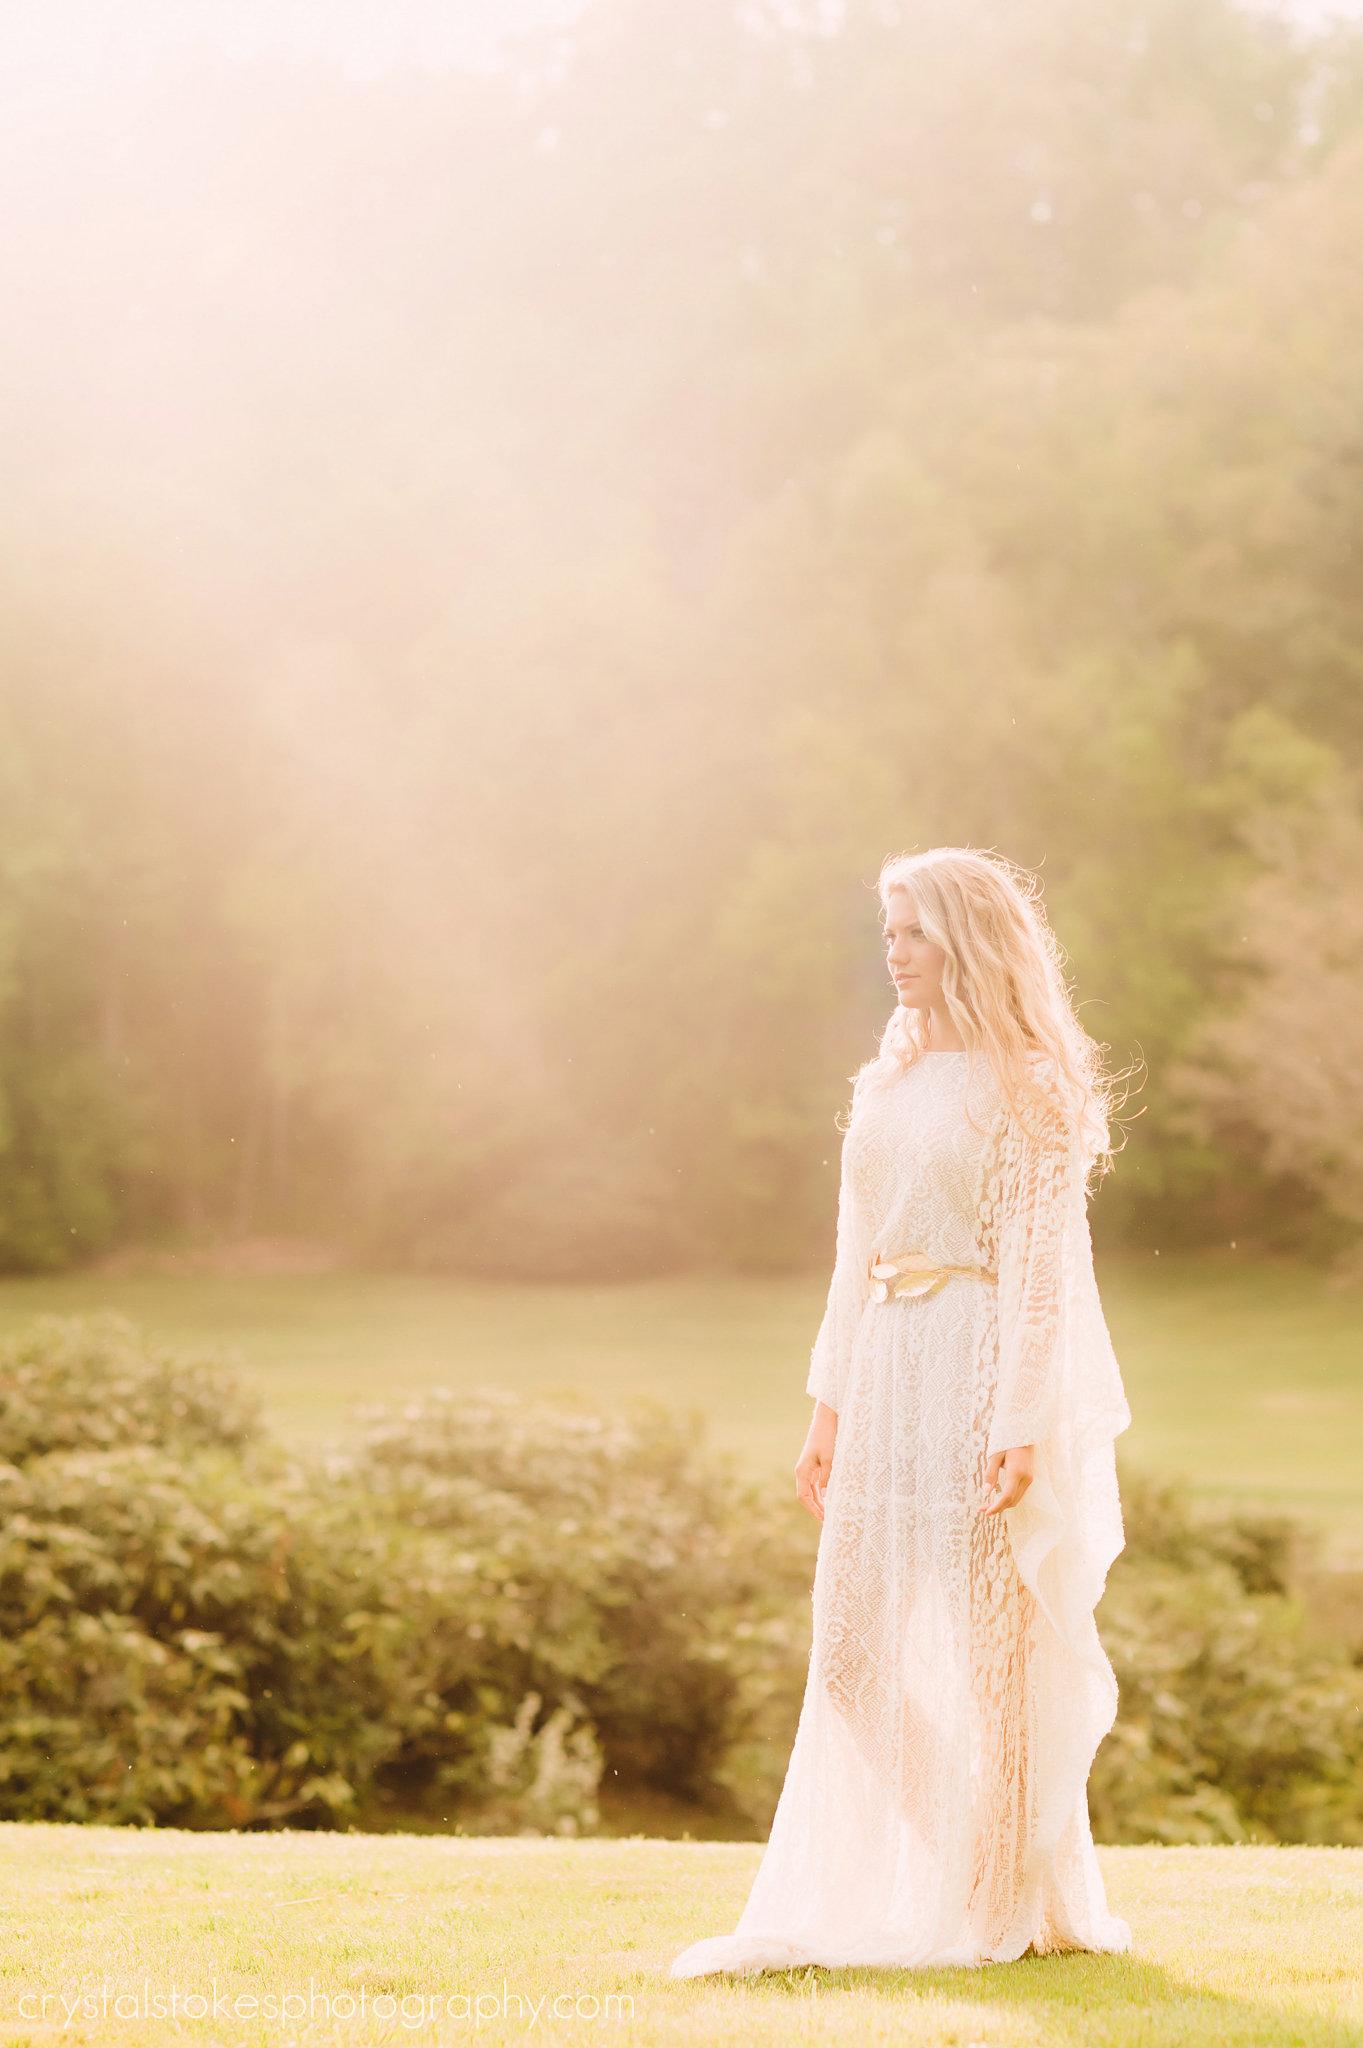 Carolina-Bride-Book-Shoot-0141.jpg